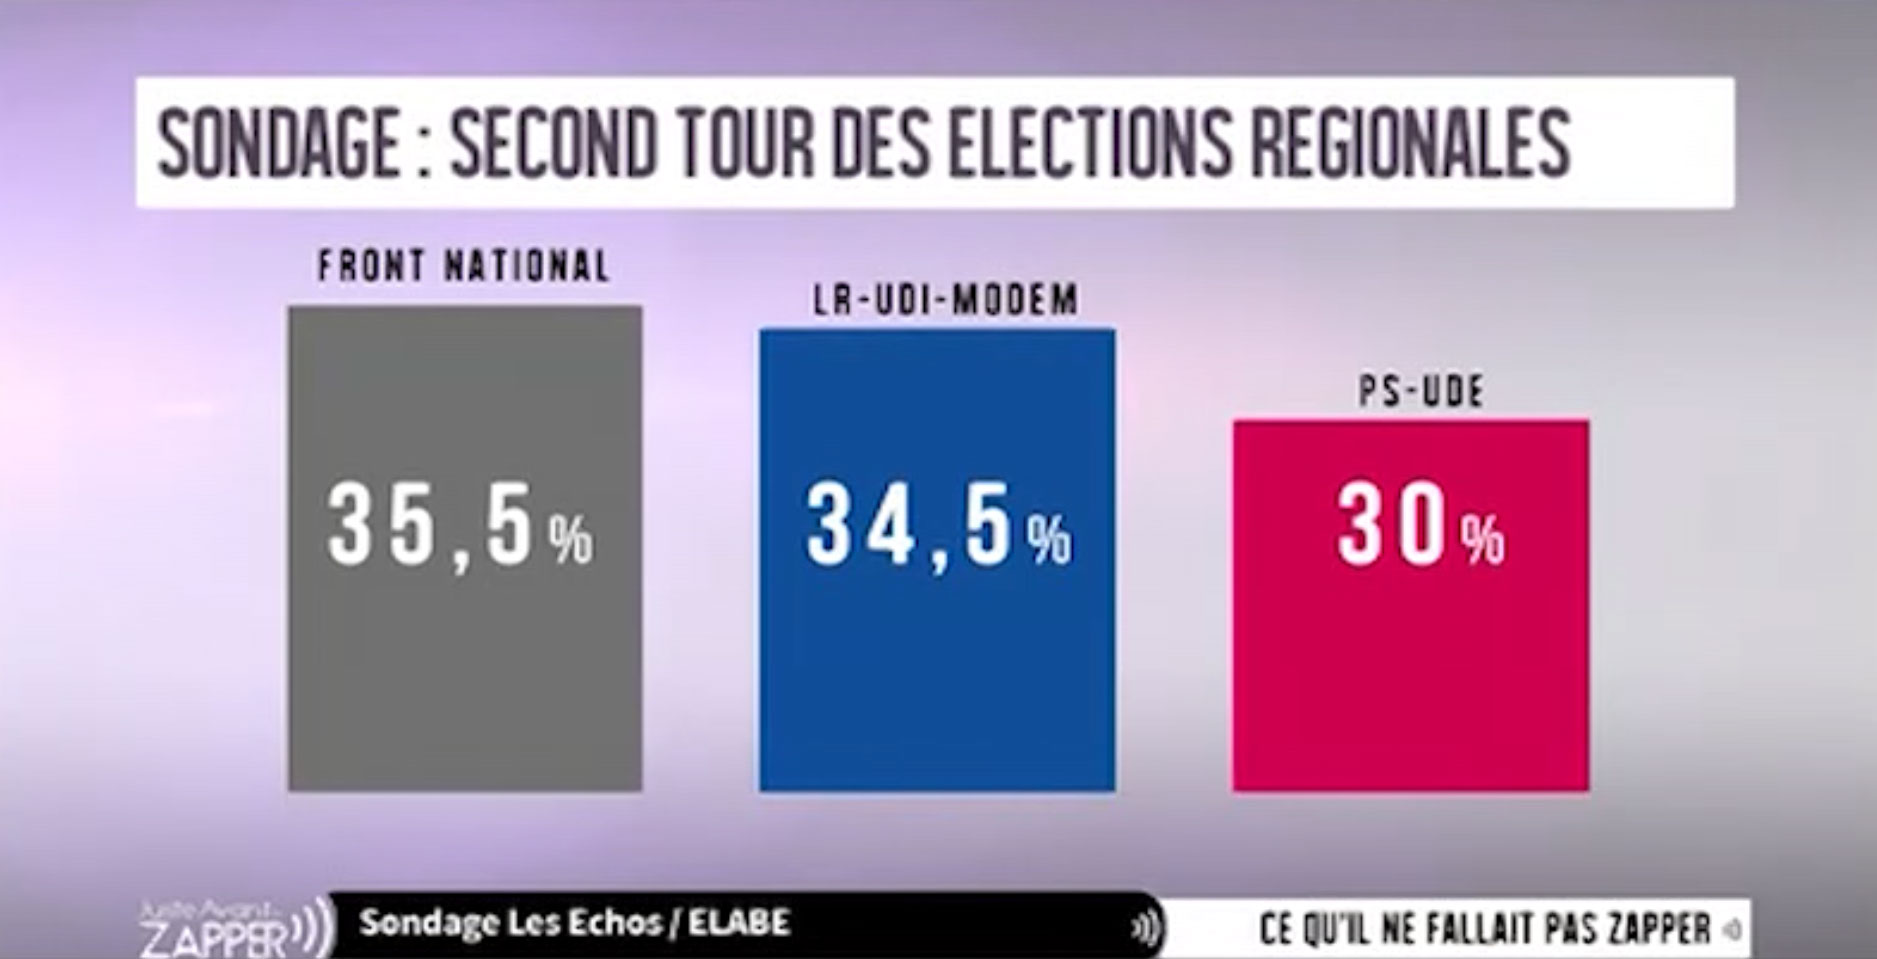 2015-12-01-mirabelle-tv-sondage-fn-en-tete